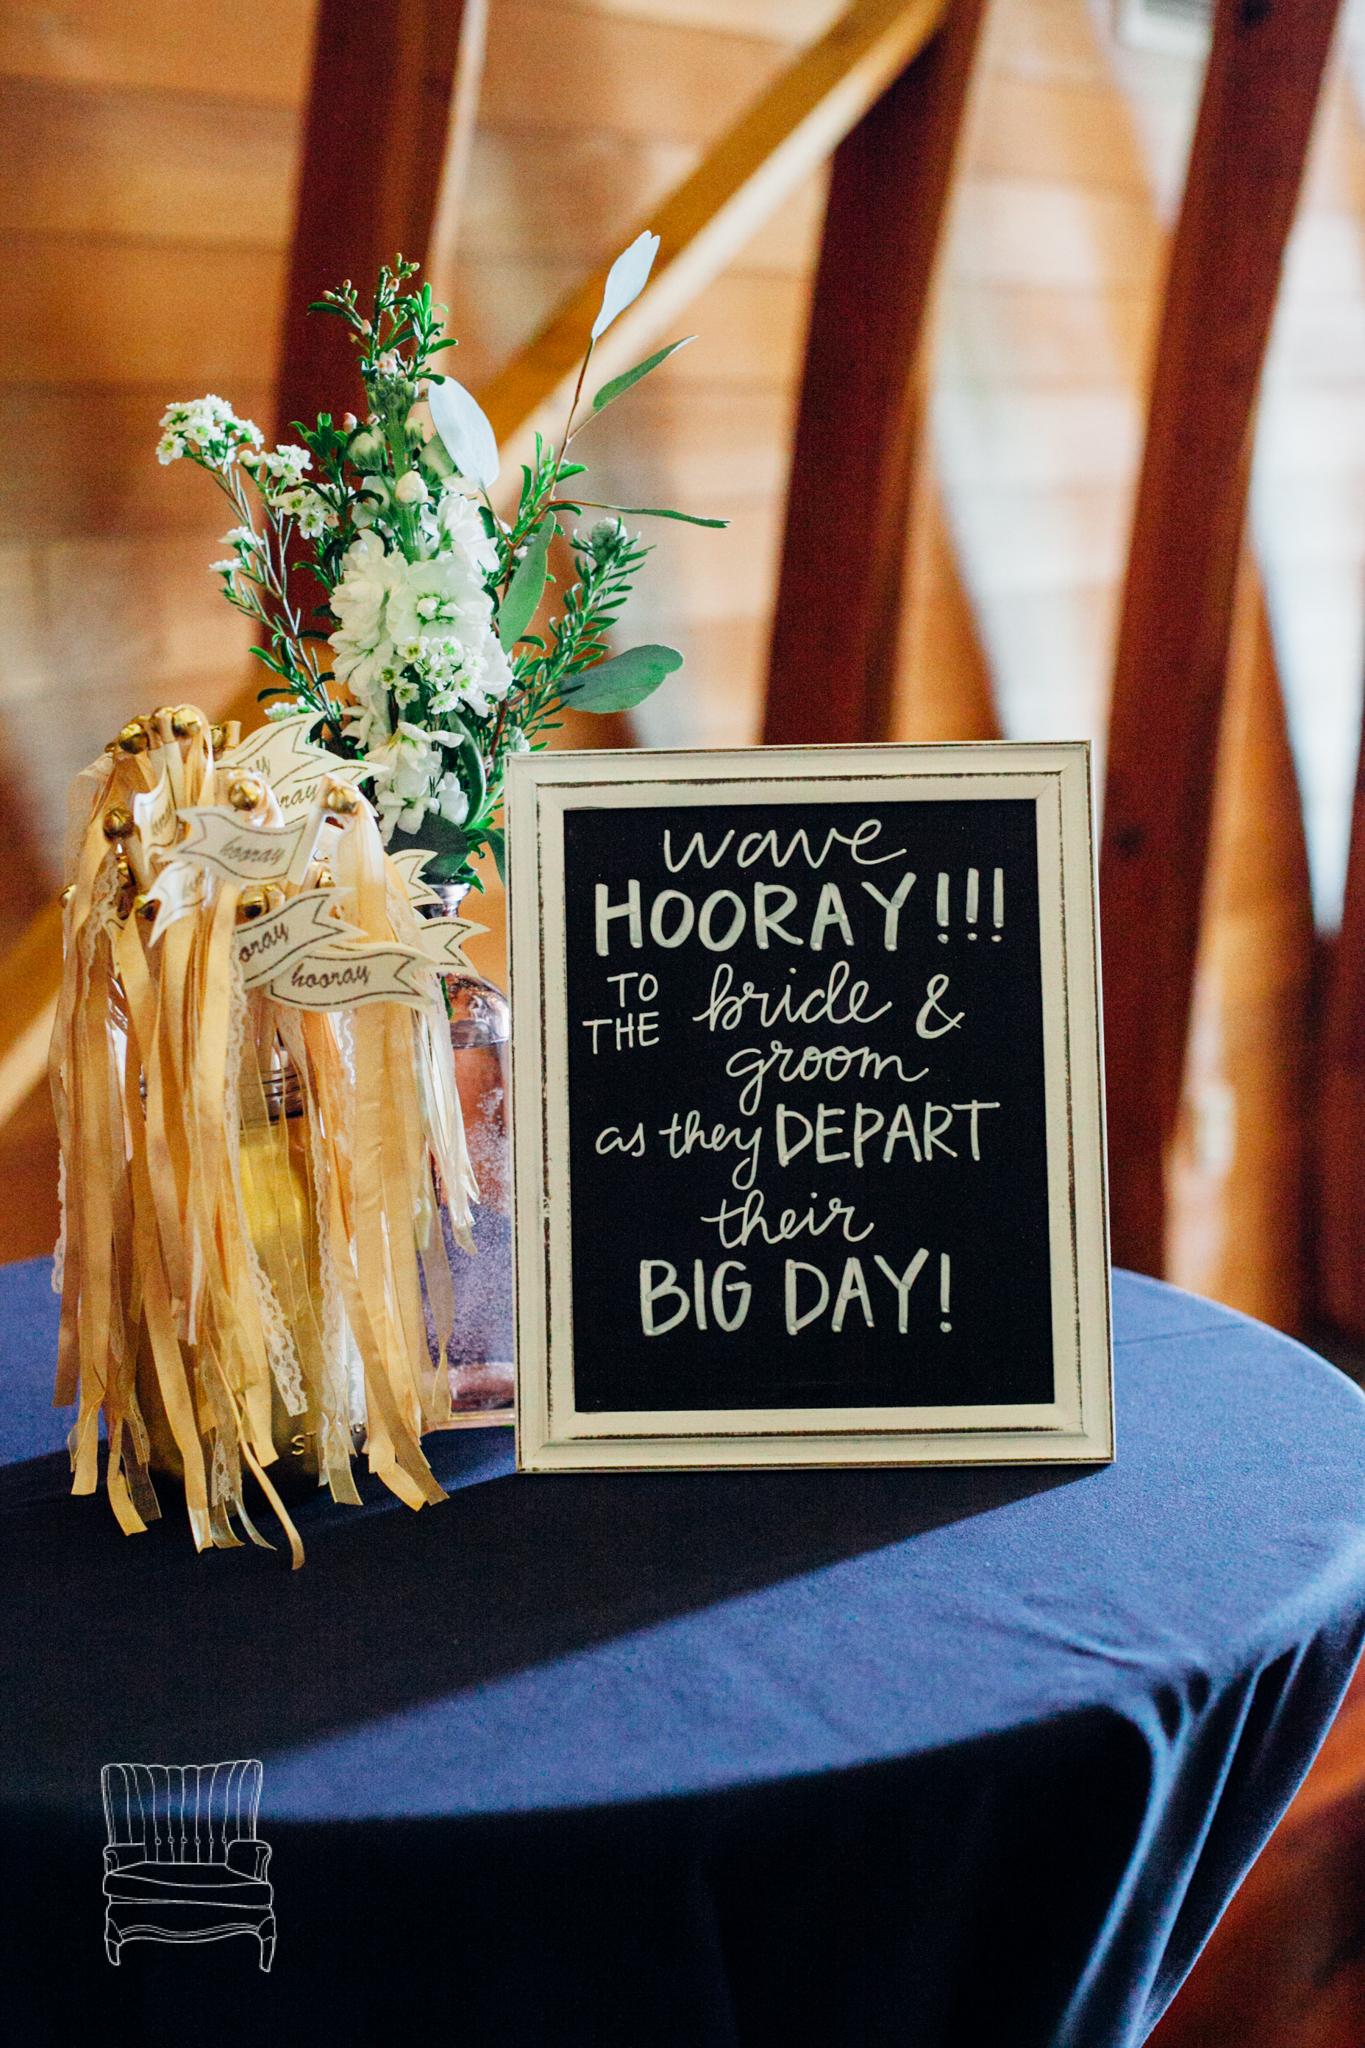 seattle-wedding-photographer-katheryn-moran-russells-bothell-wilkins-wedding-photo-2.jpg